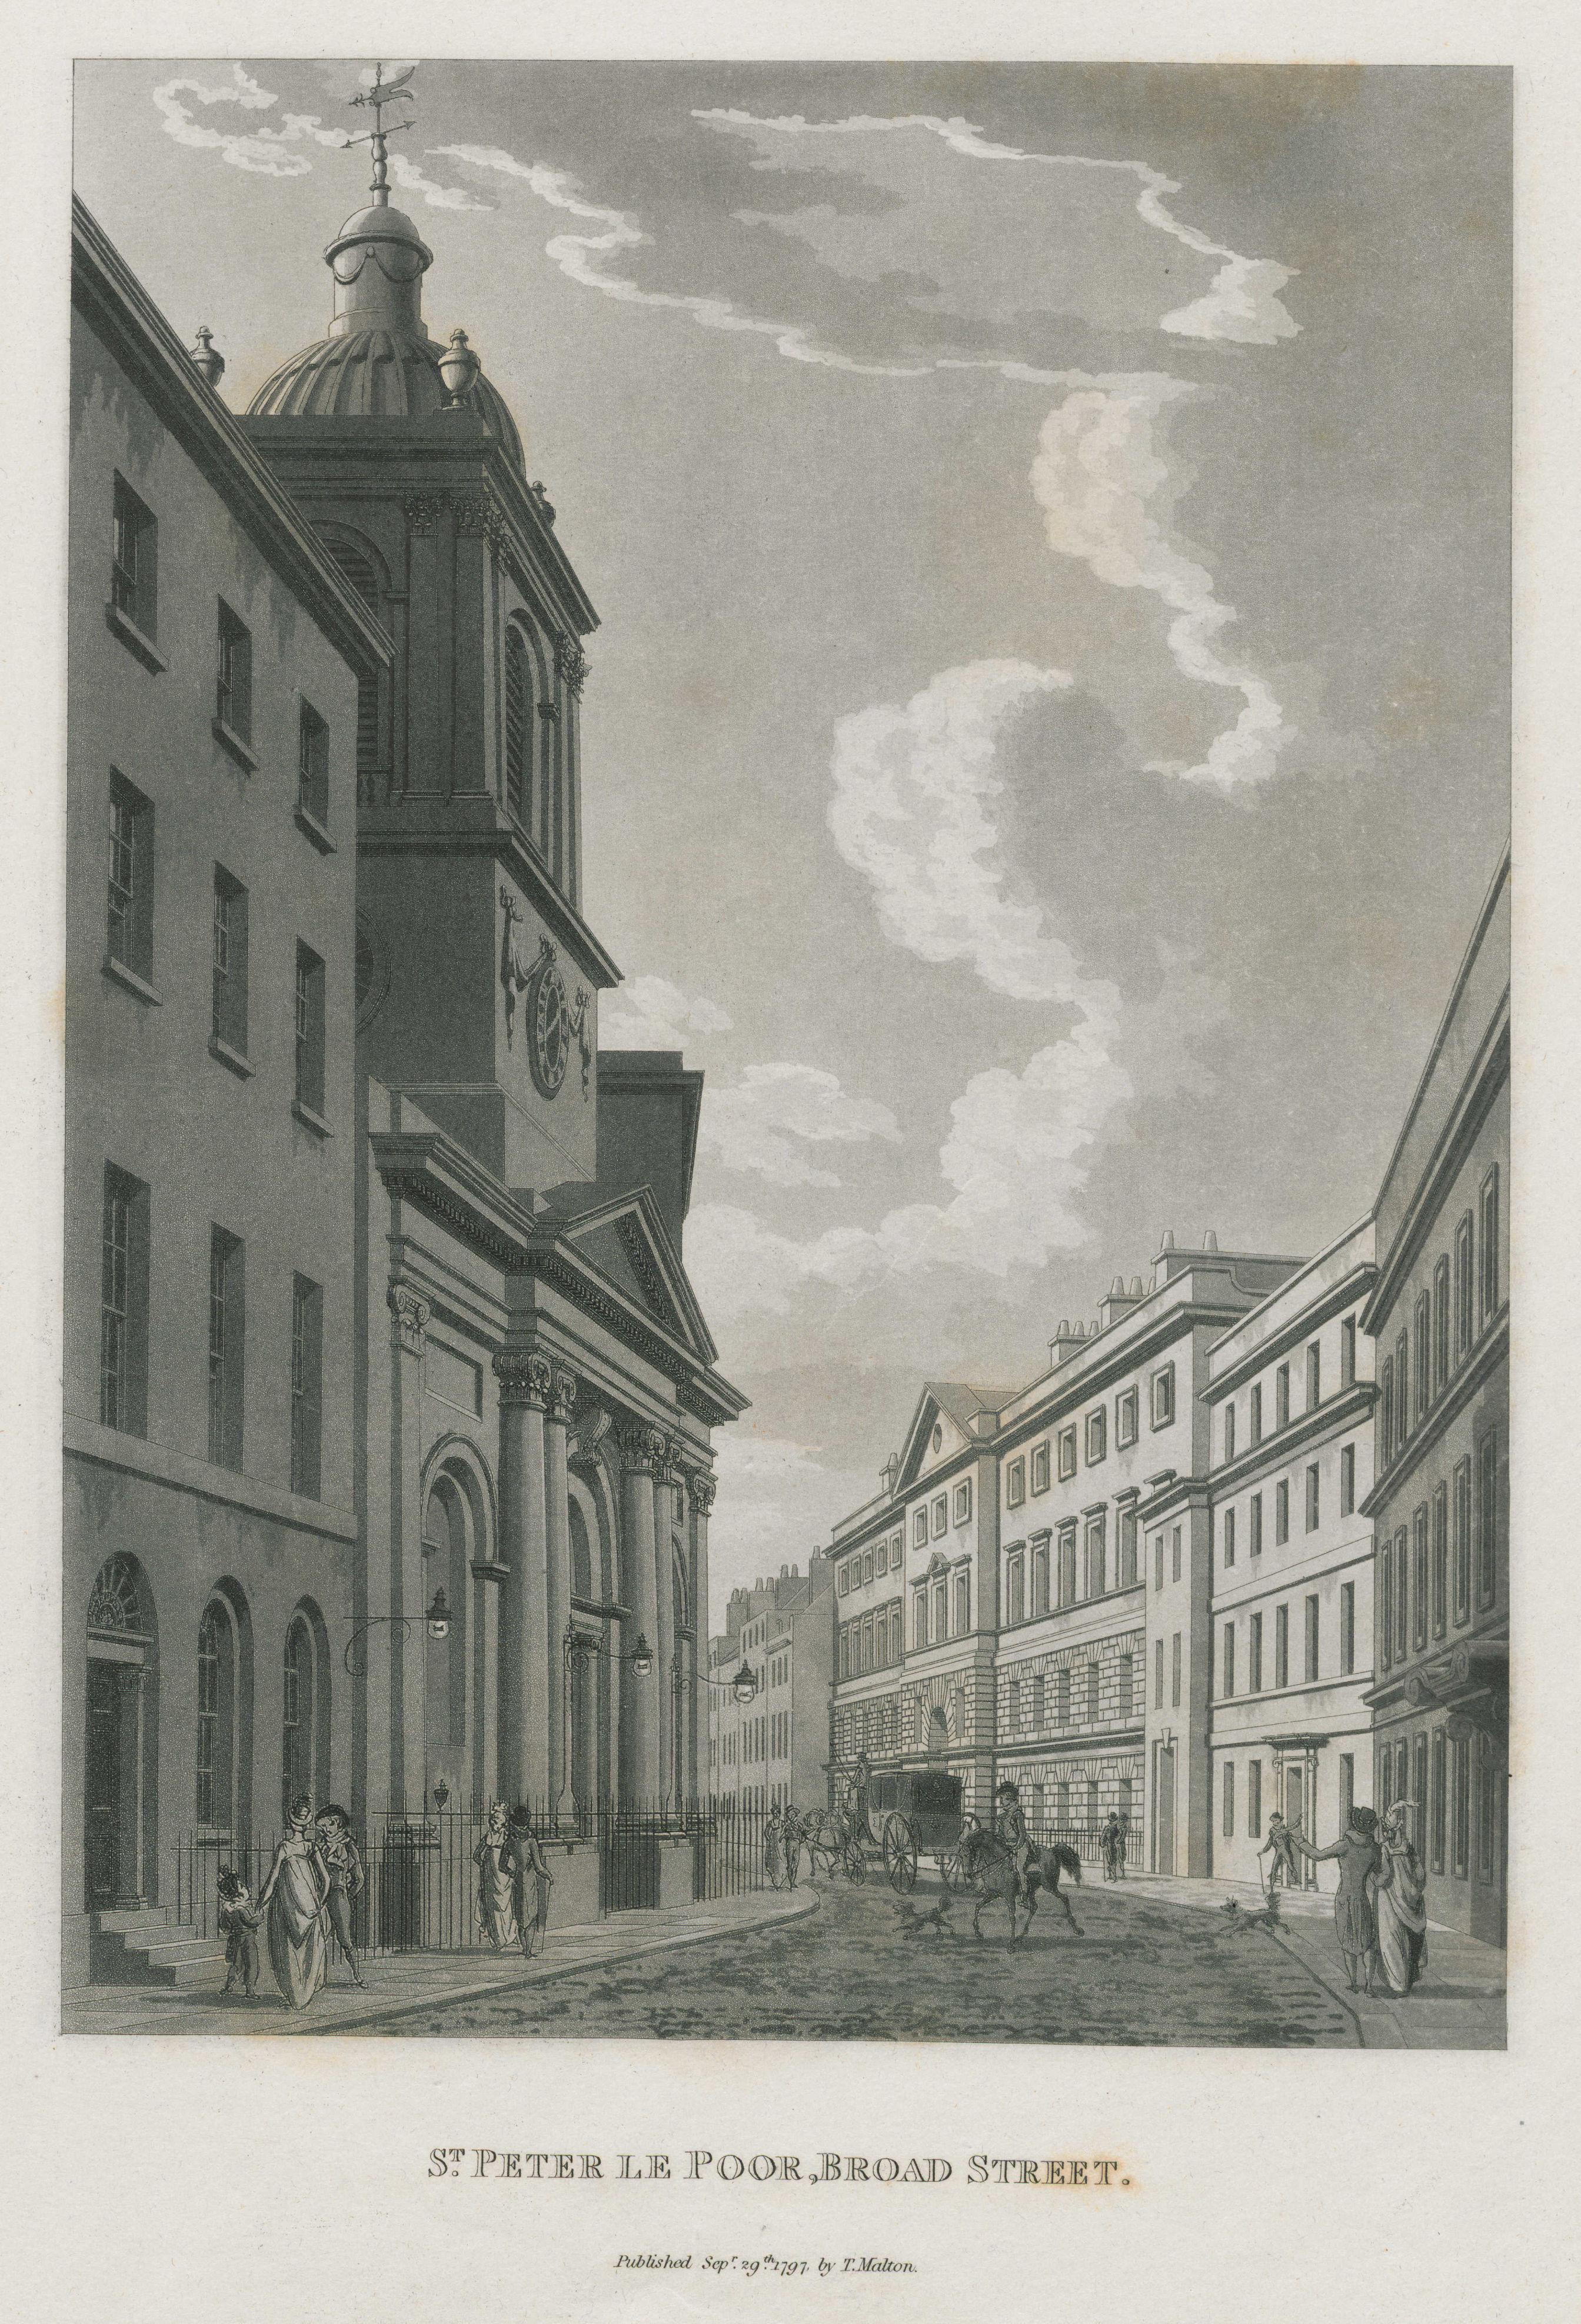 071 - Malton - St Peter le Poor, Broad Street